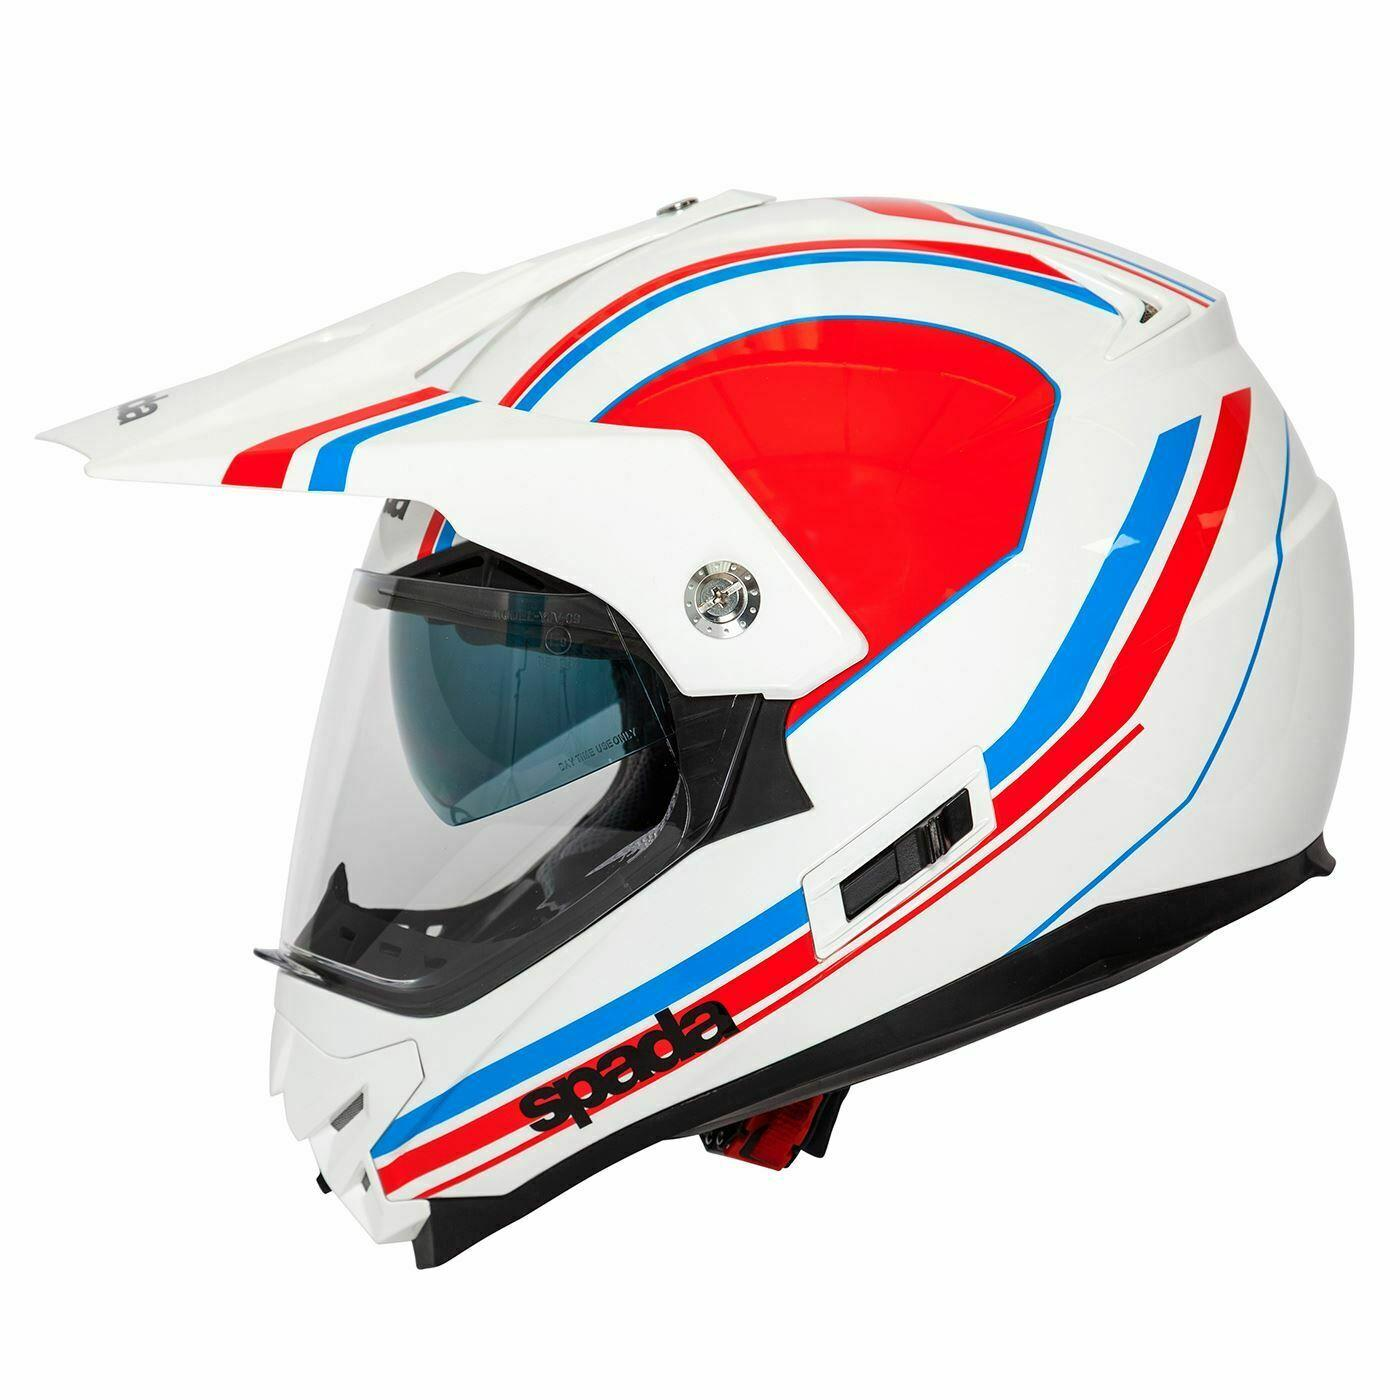 Spada Intrepid Helmet Full Face Off Road Adventure Motorcycle Bike Sun Visor